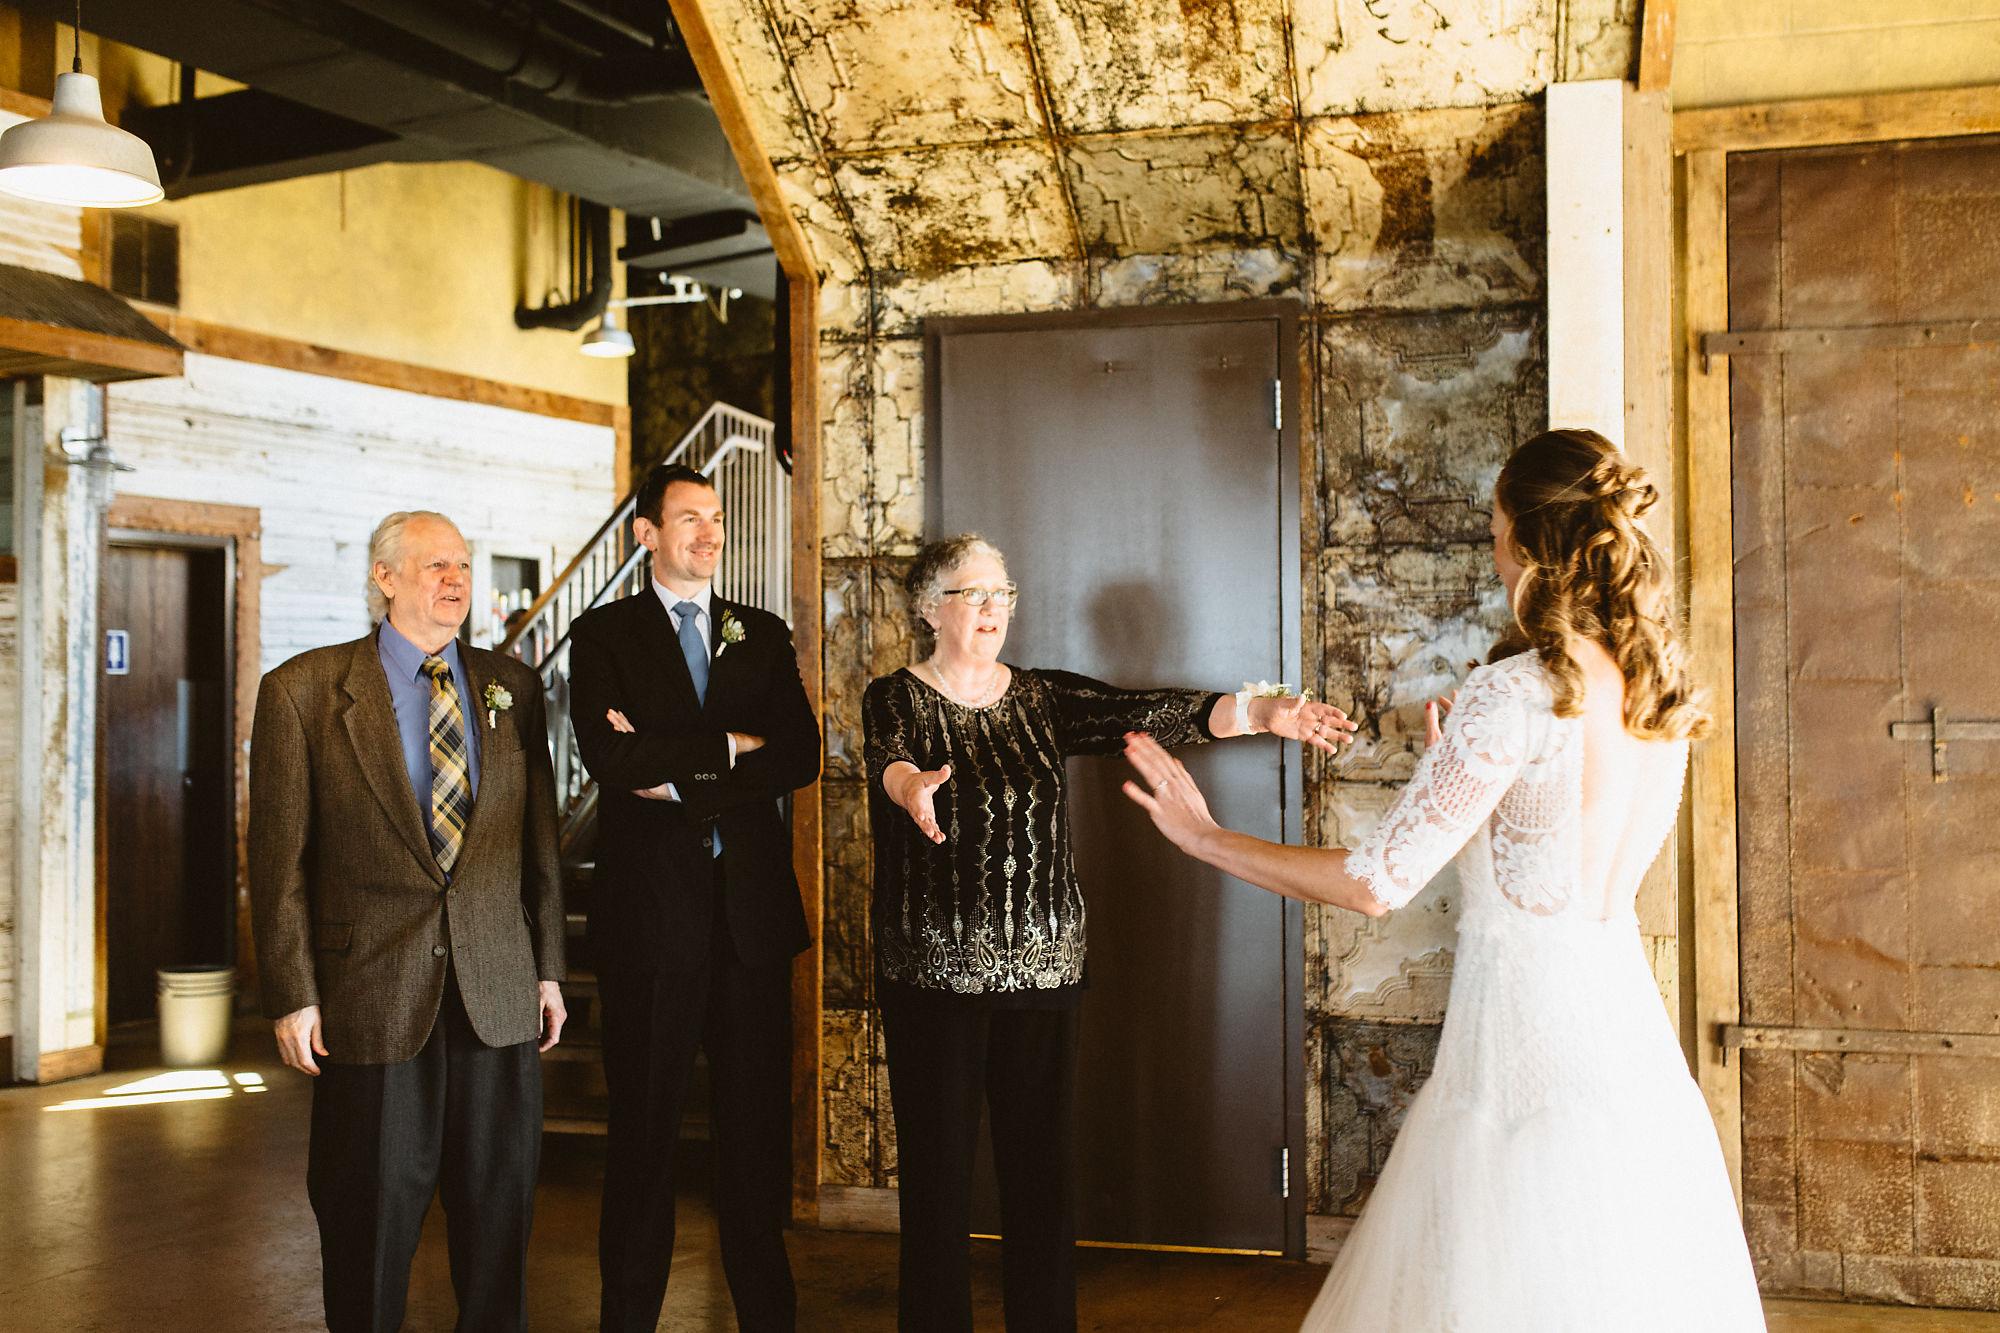 jessica_austin_oasis_brewery_wedding_photos121518.jpg